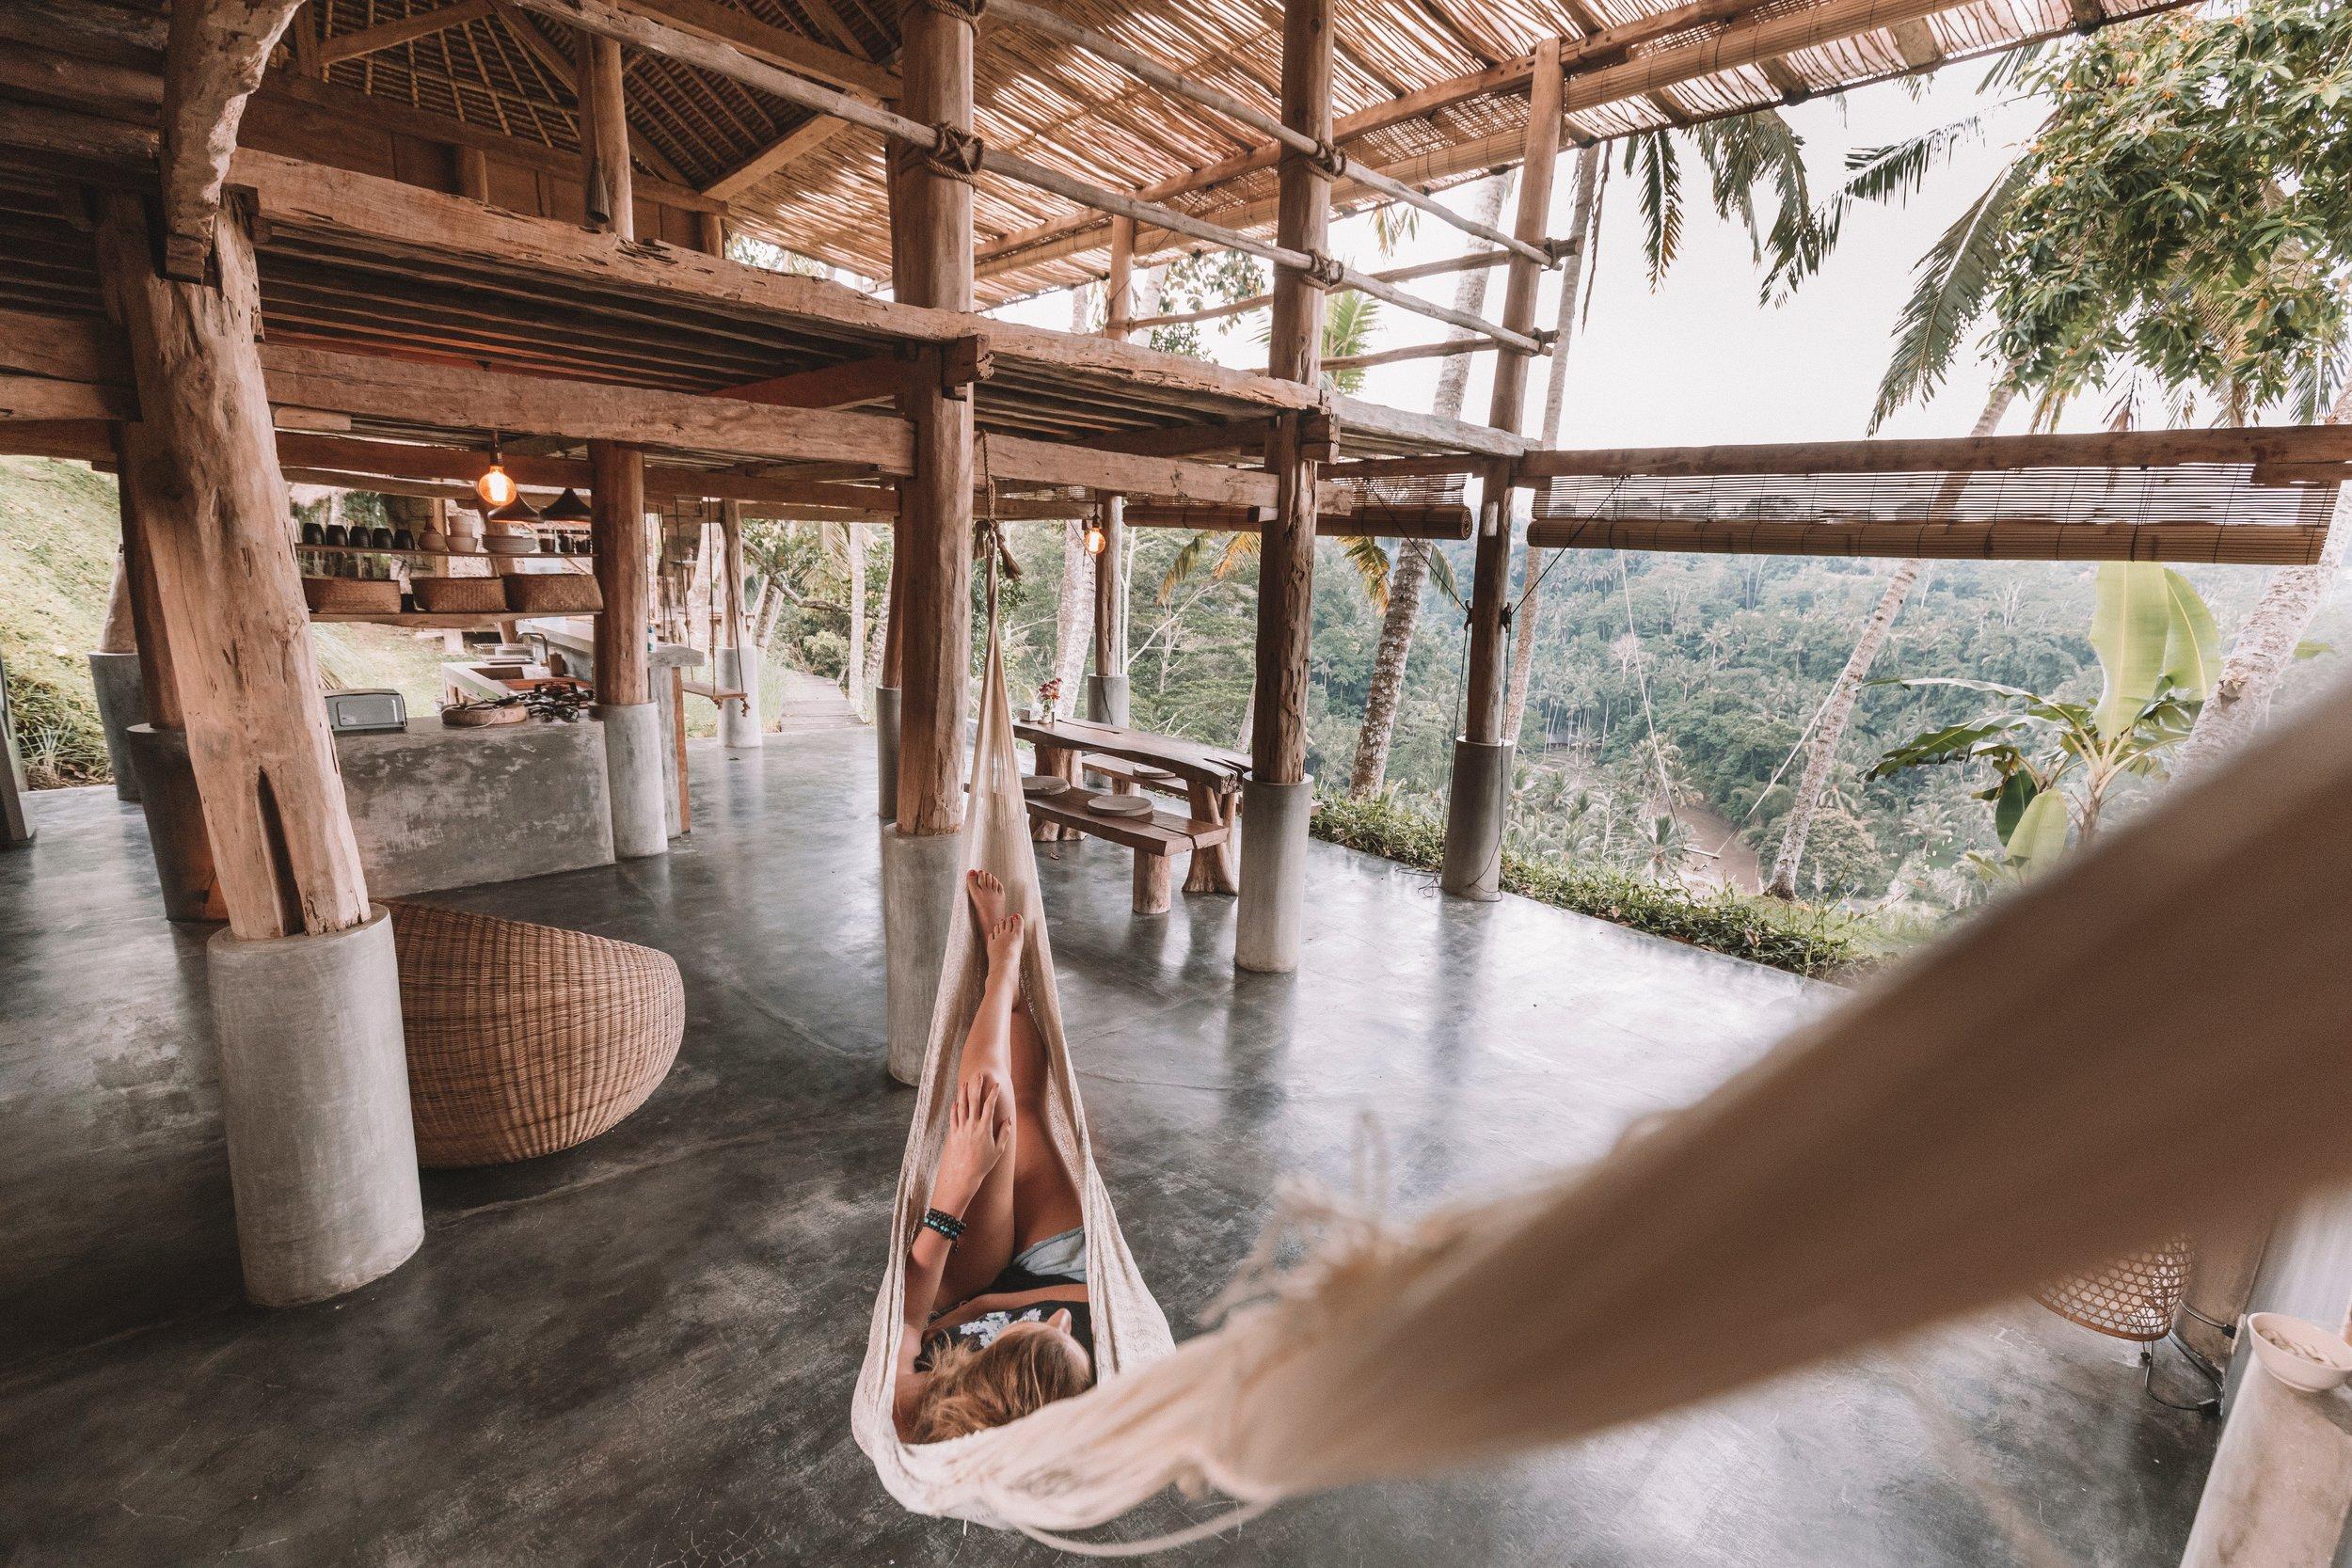 bali-unsettled-ubud-retreat-digital-nomad-work-life-sabbatical